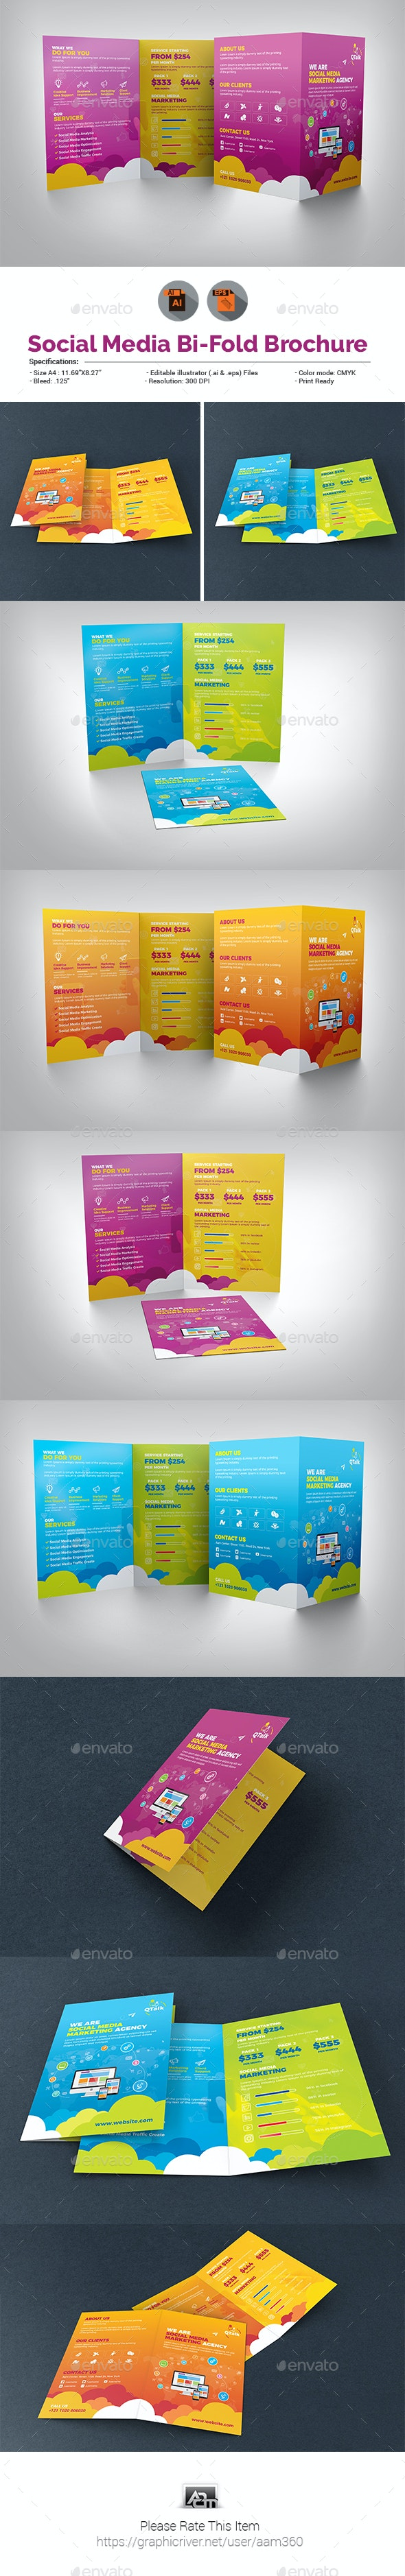 Social Media Marketing Bifold Brochure - Corporate Brochures